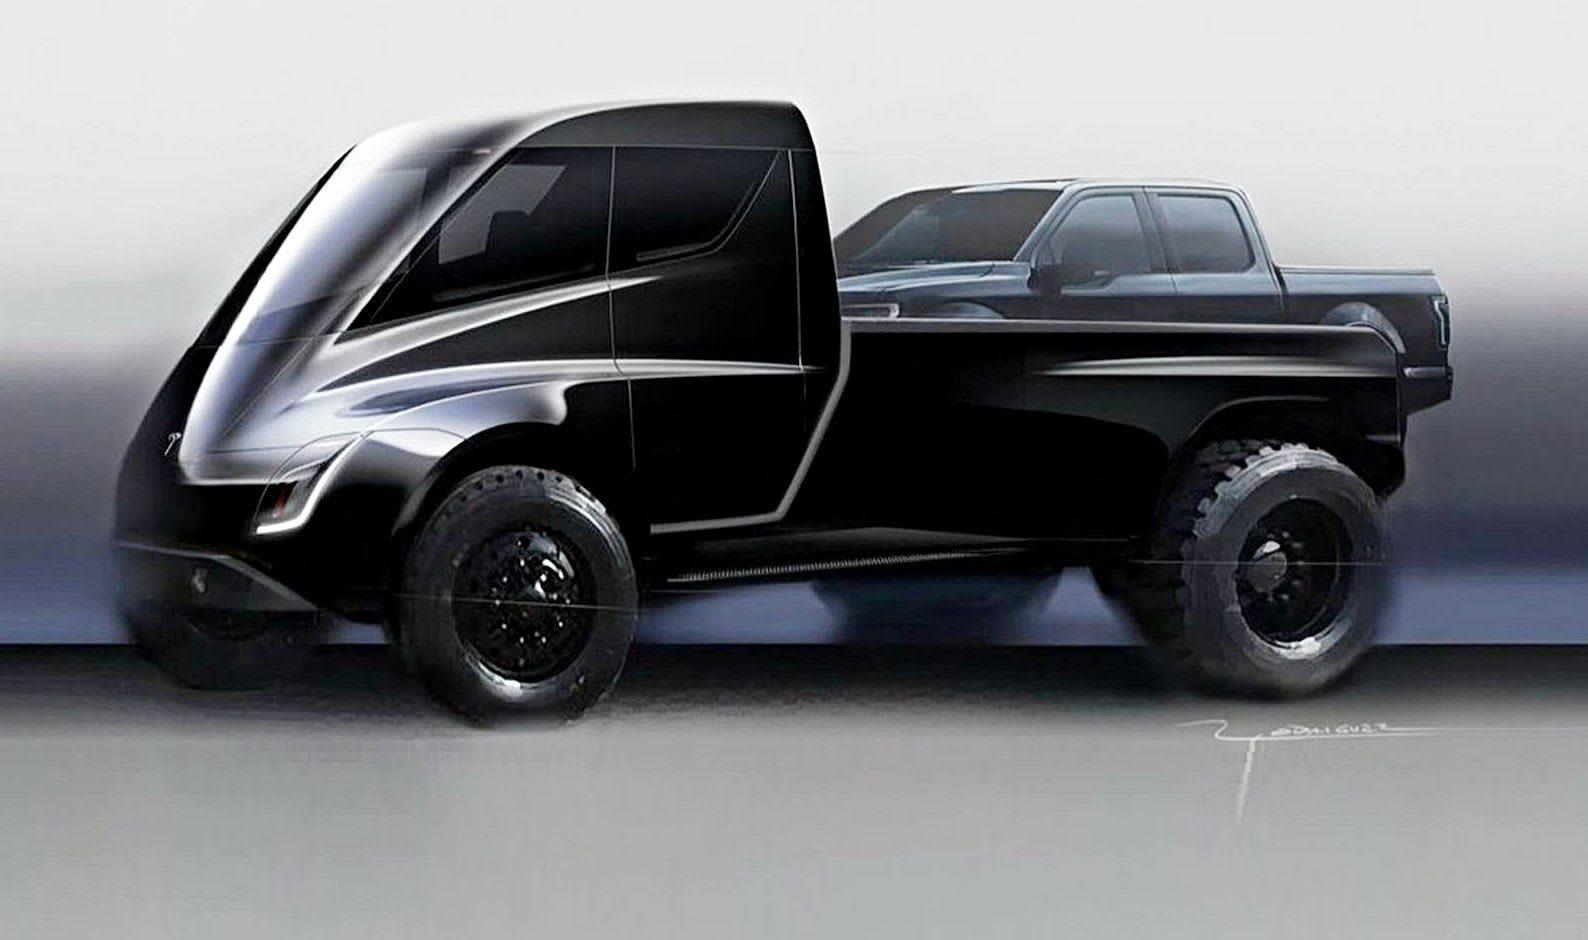 Tesla Cybertruck pickup to be unveiled Nov. 21, Elon Musk says